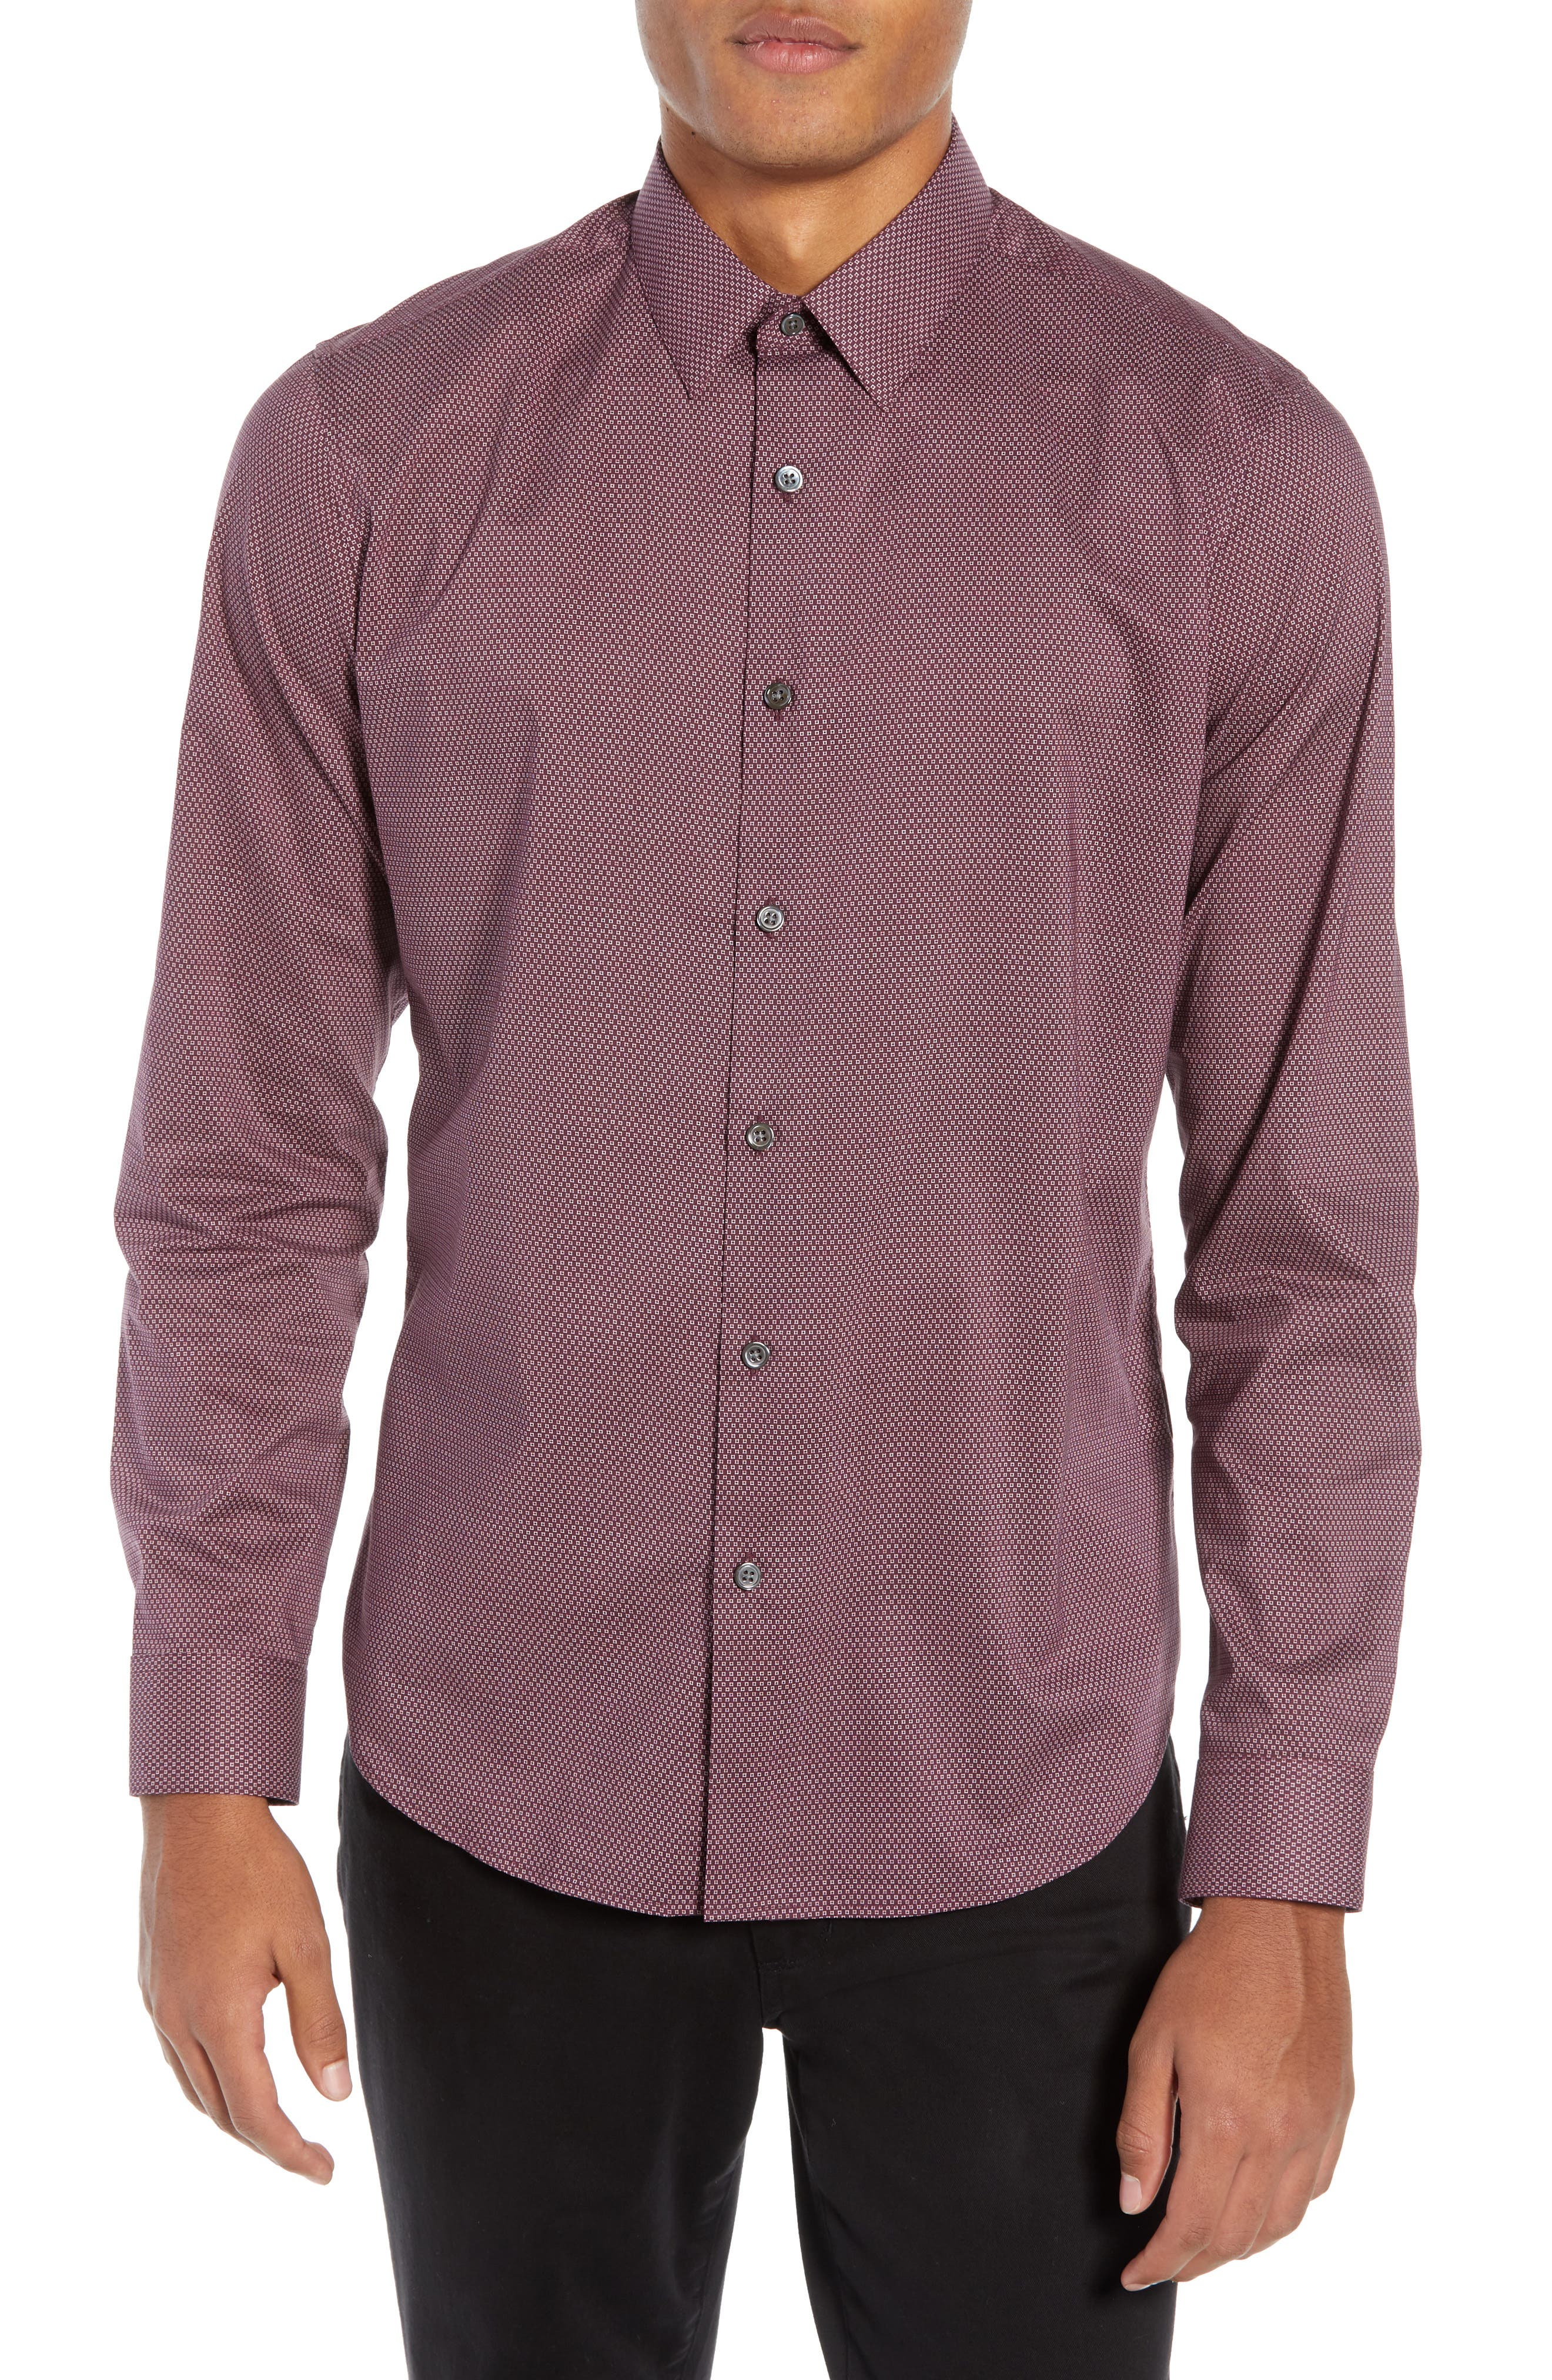 Sylvain Regular Fit Cinder Print Sport Shirt,                         Main,                         color, MALBEC MULTI